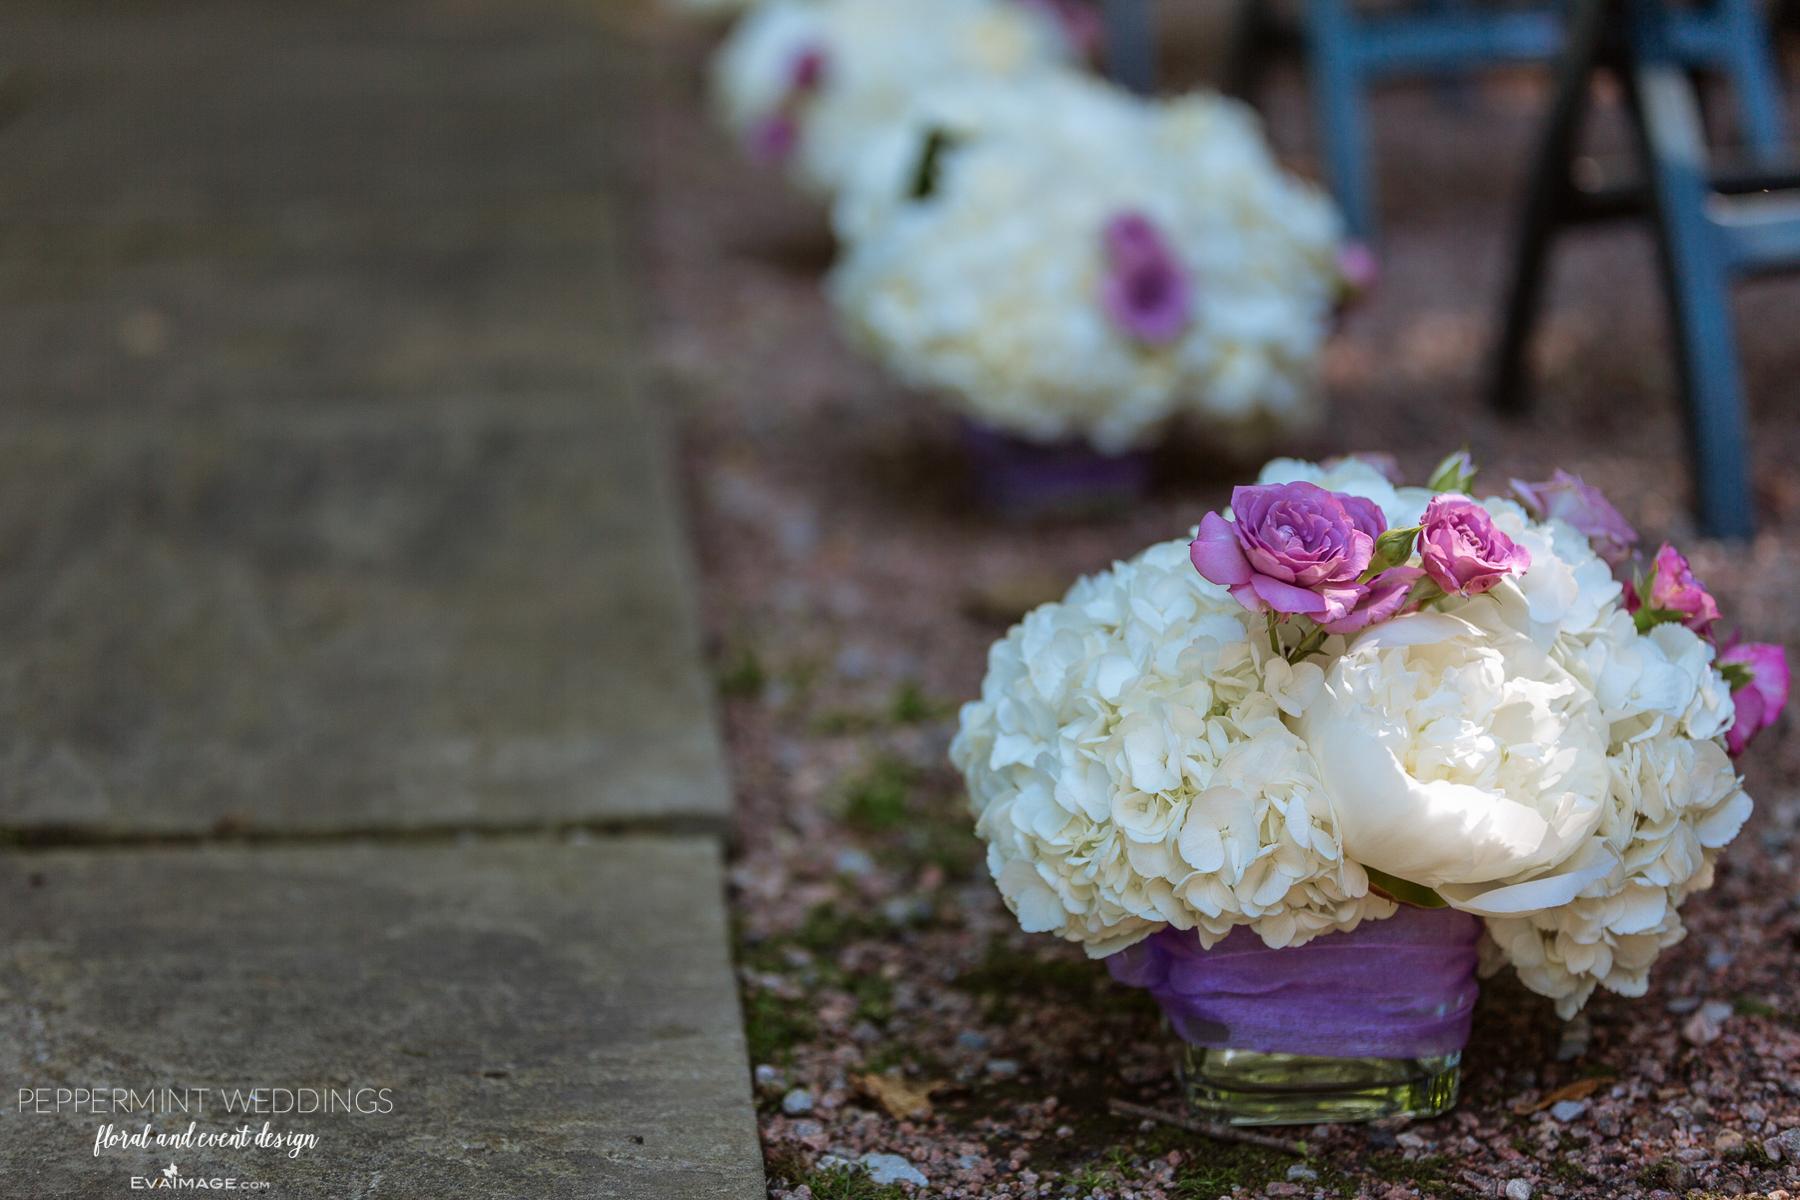 The Estates of Sunnybrook Summer Wedding